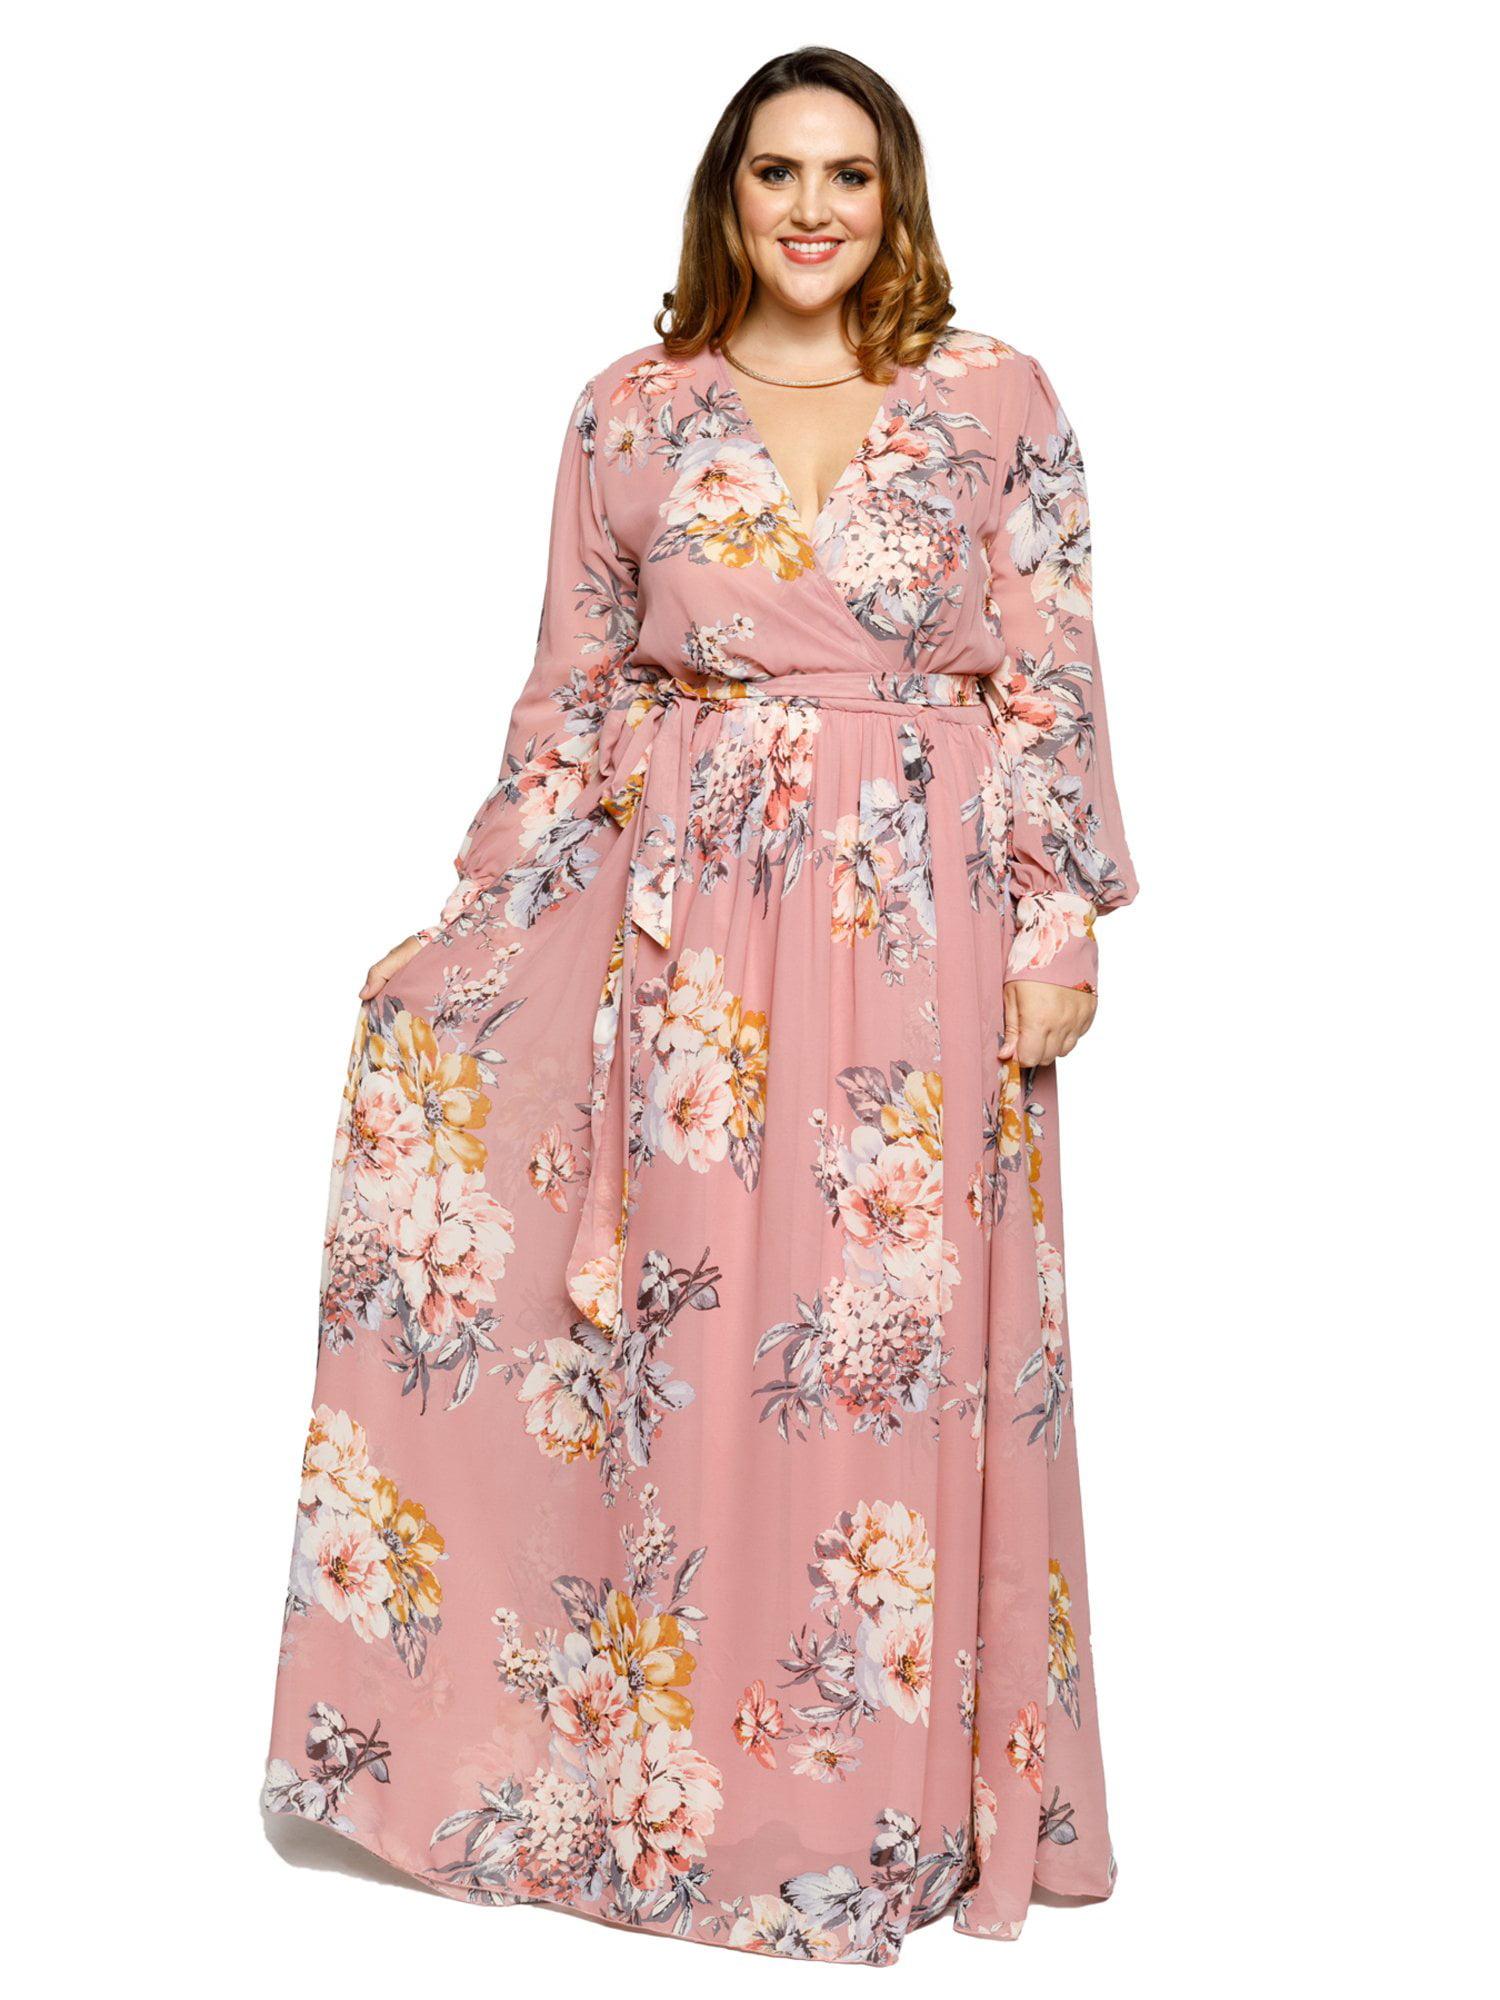 18a45cf538 Xehar - Xehar Women s Plus Size Casual Sexy V-Neck Floral Print Surplice Long  Sleeve Maxi Dress - Walmart.com